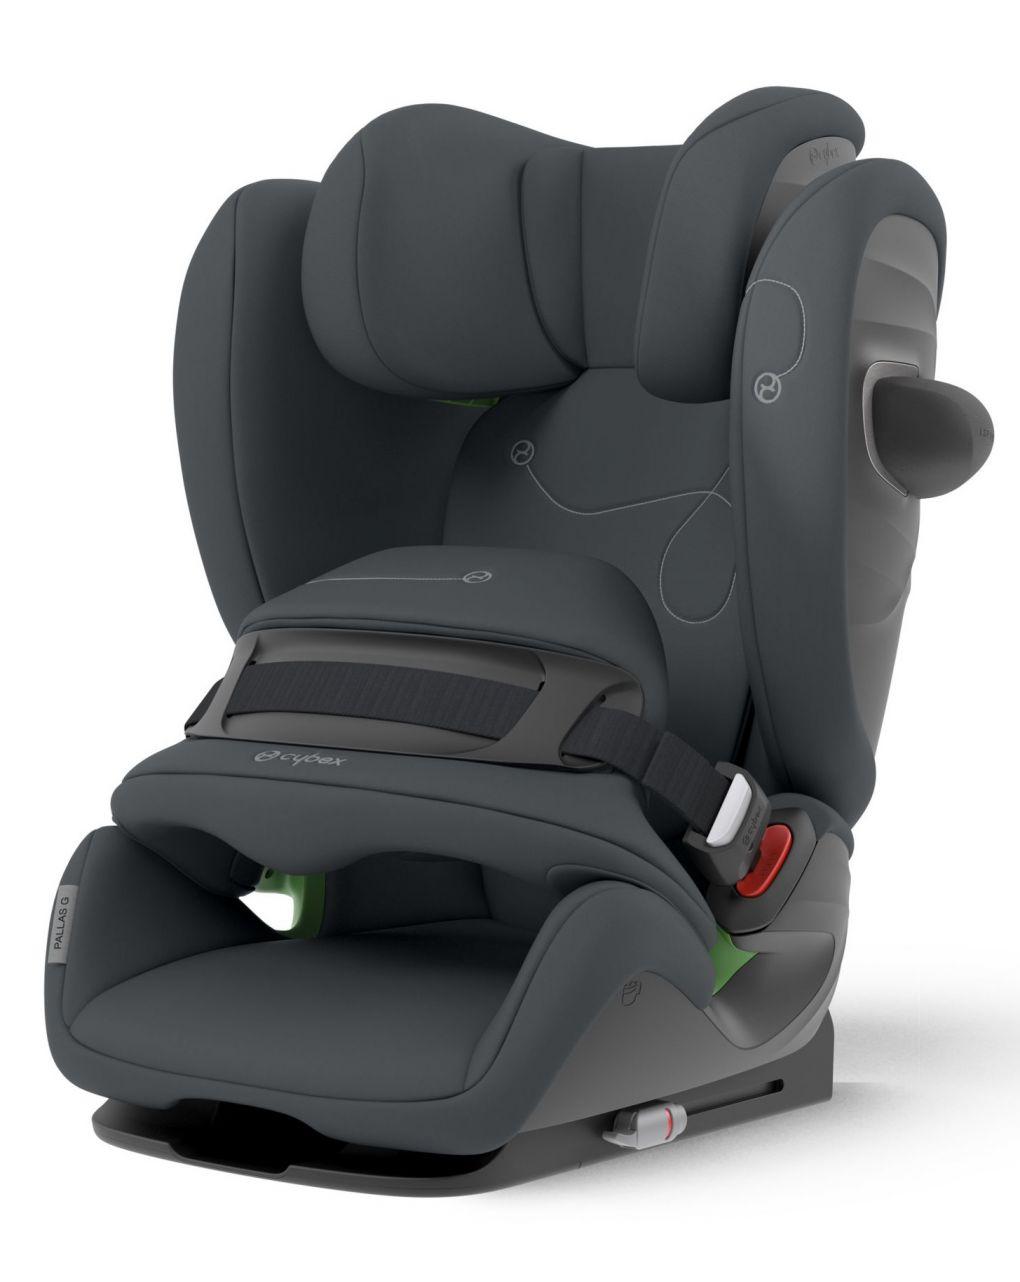 Cybex Κάθισμα Αυτοκινήτου Pallas G I-Size - Ανθρακί